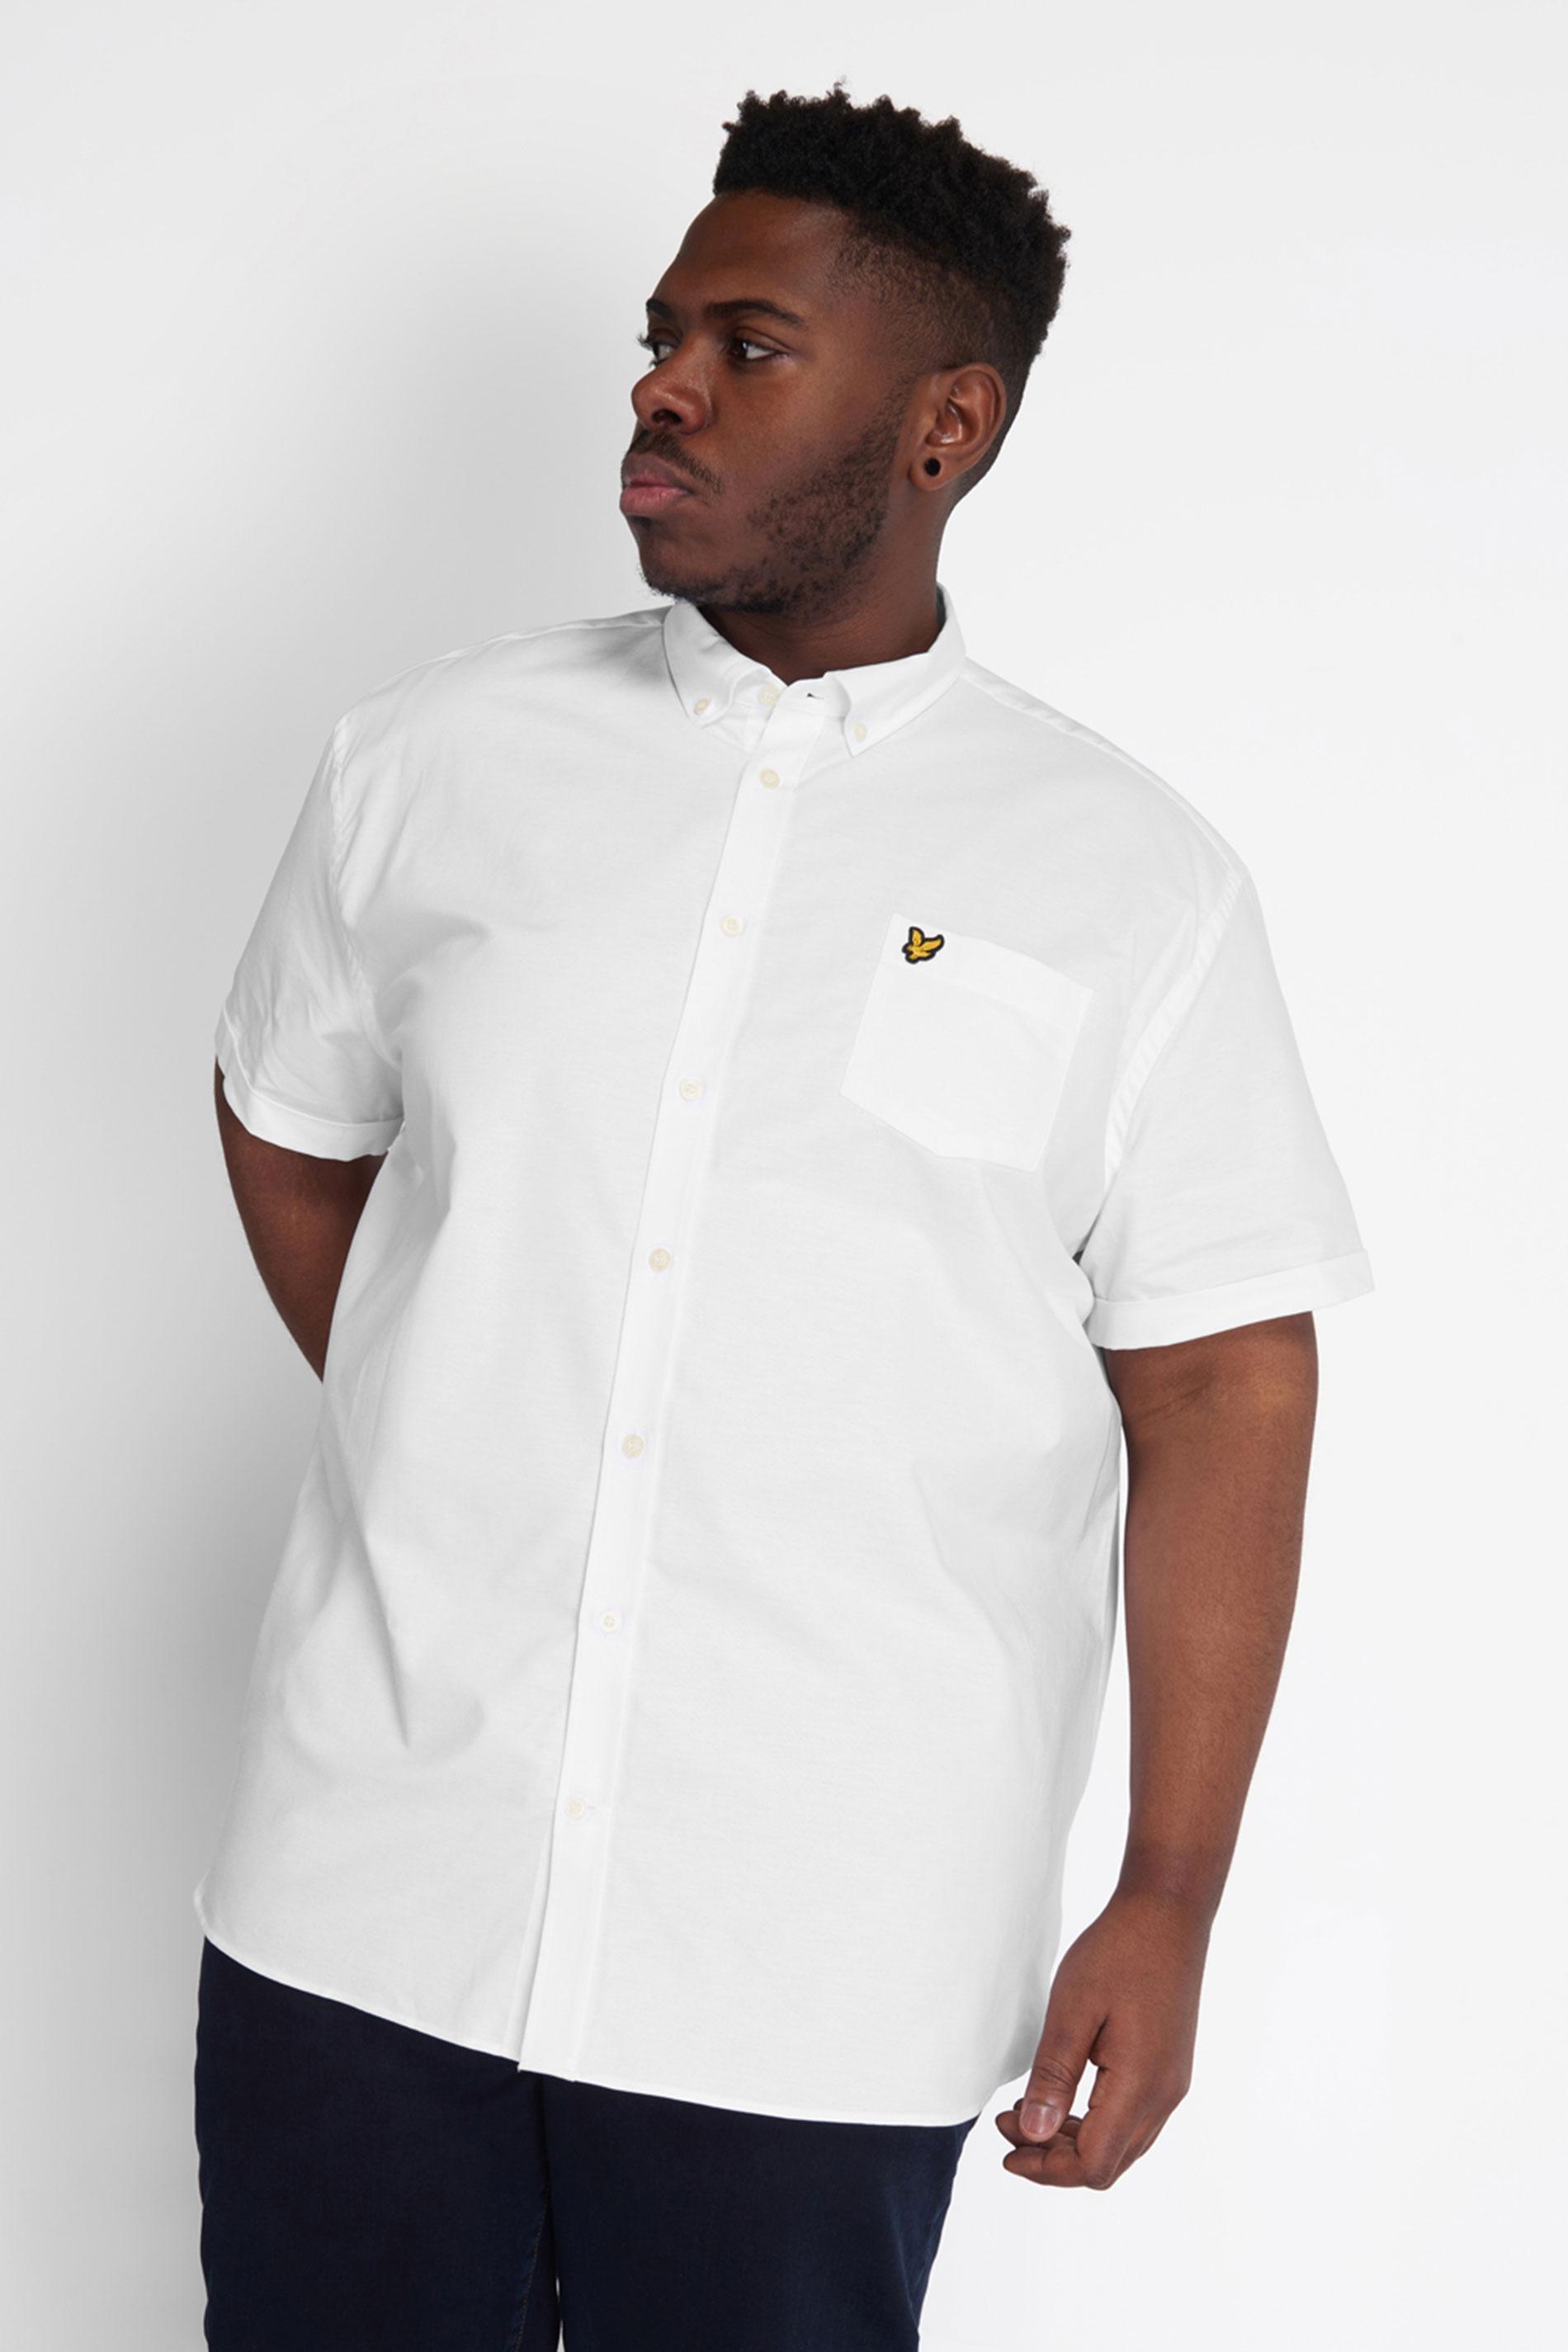 LYLE & SCOTT White Short Sleeve Oxford Shirt